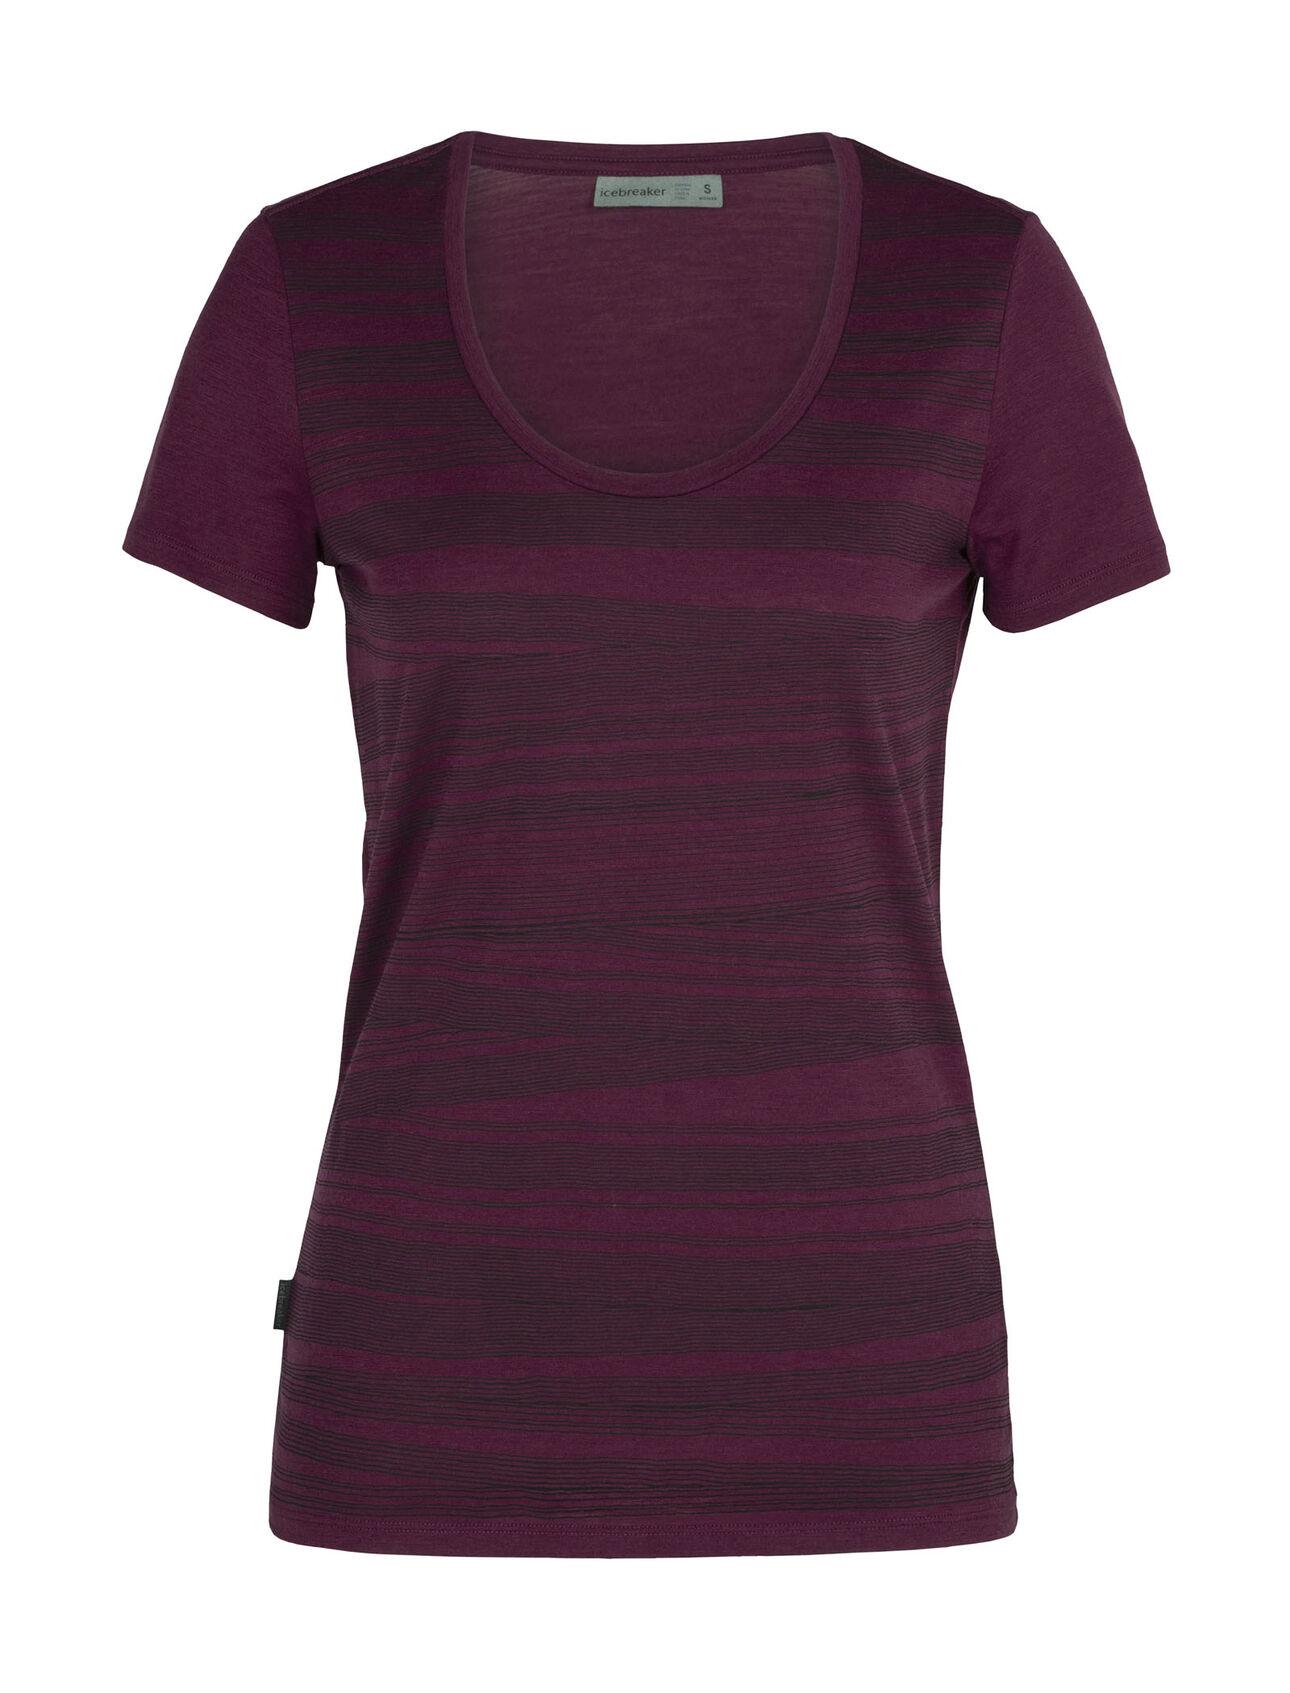 Merino Tech Lite Short Sleeve Scoop Neck T-Shirt 1000 Lines